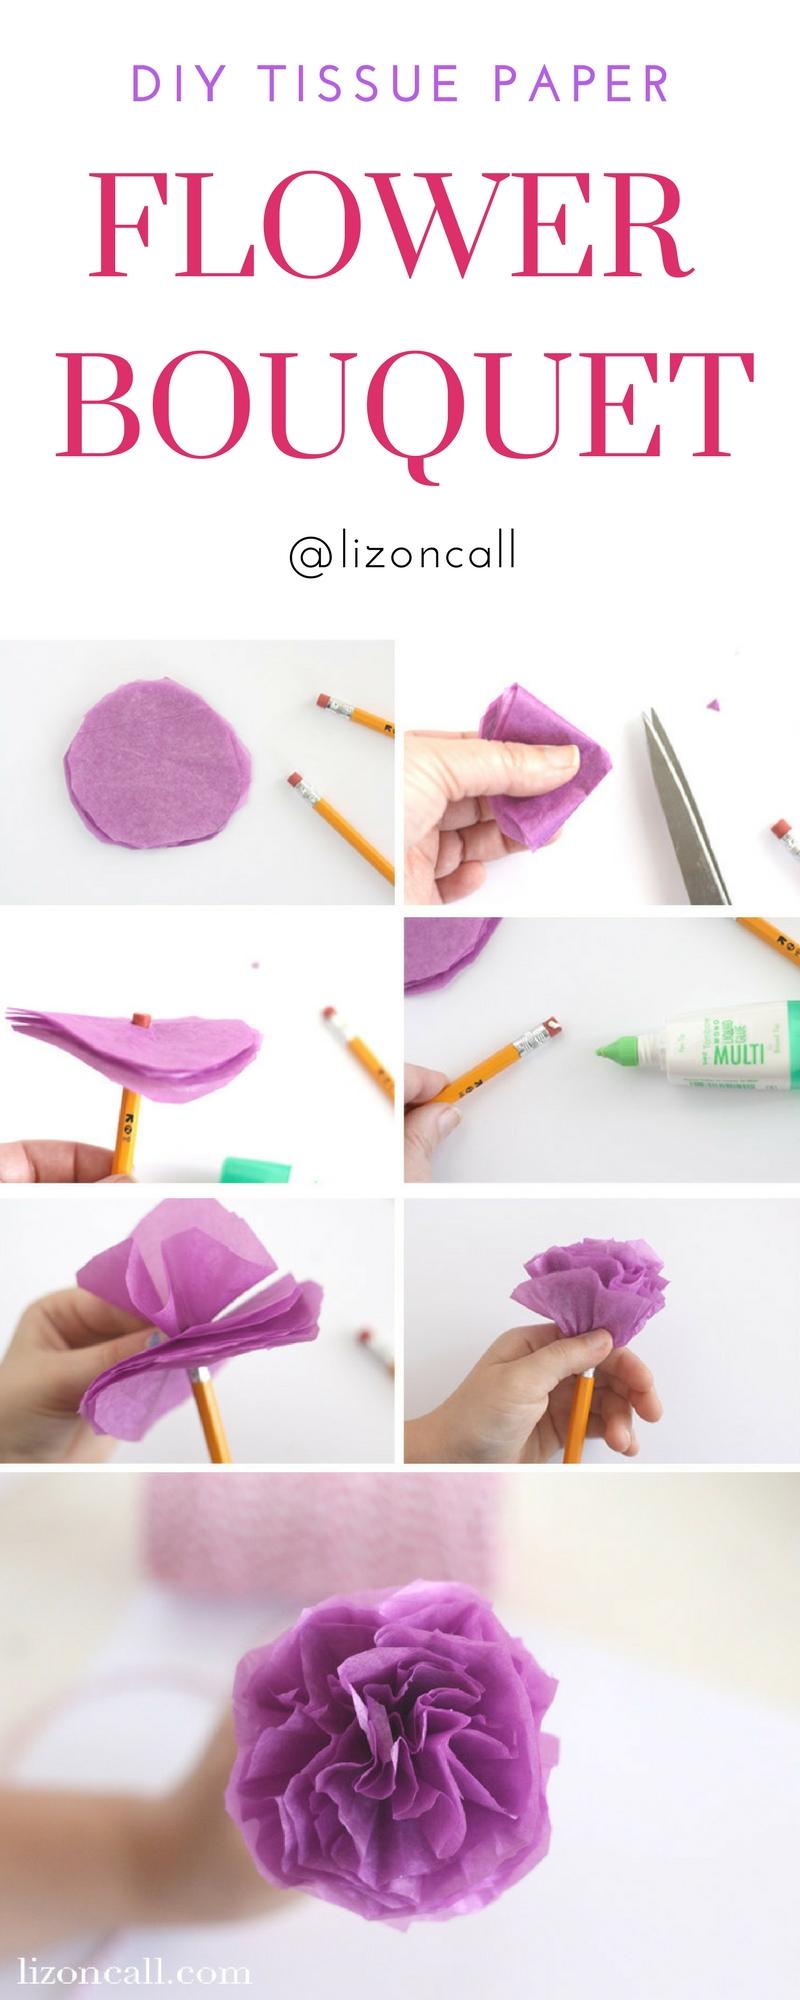 Diy Tissue Paper Flower Tutorial Teacher Appreciation Liz On Call